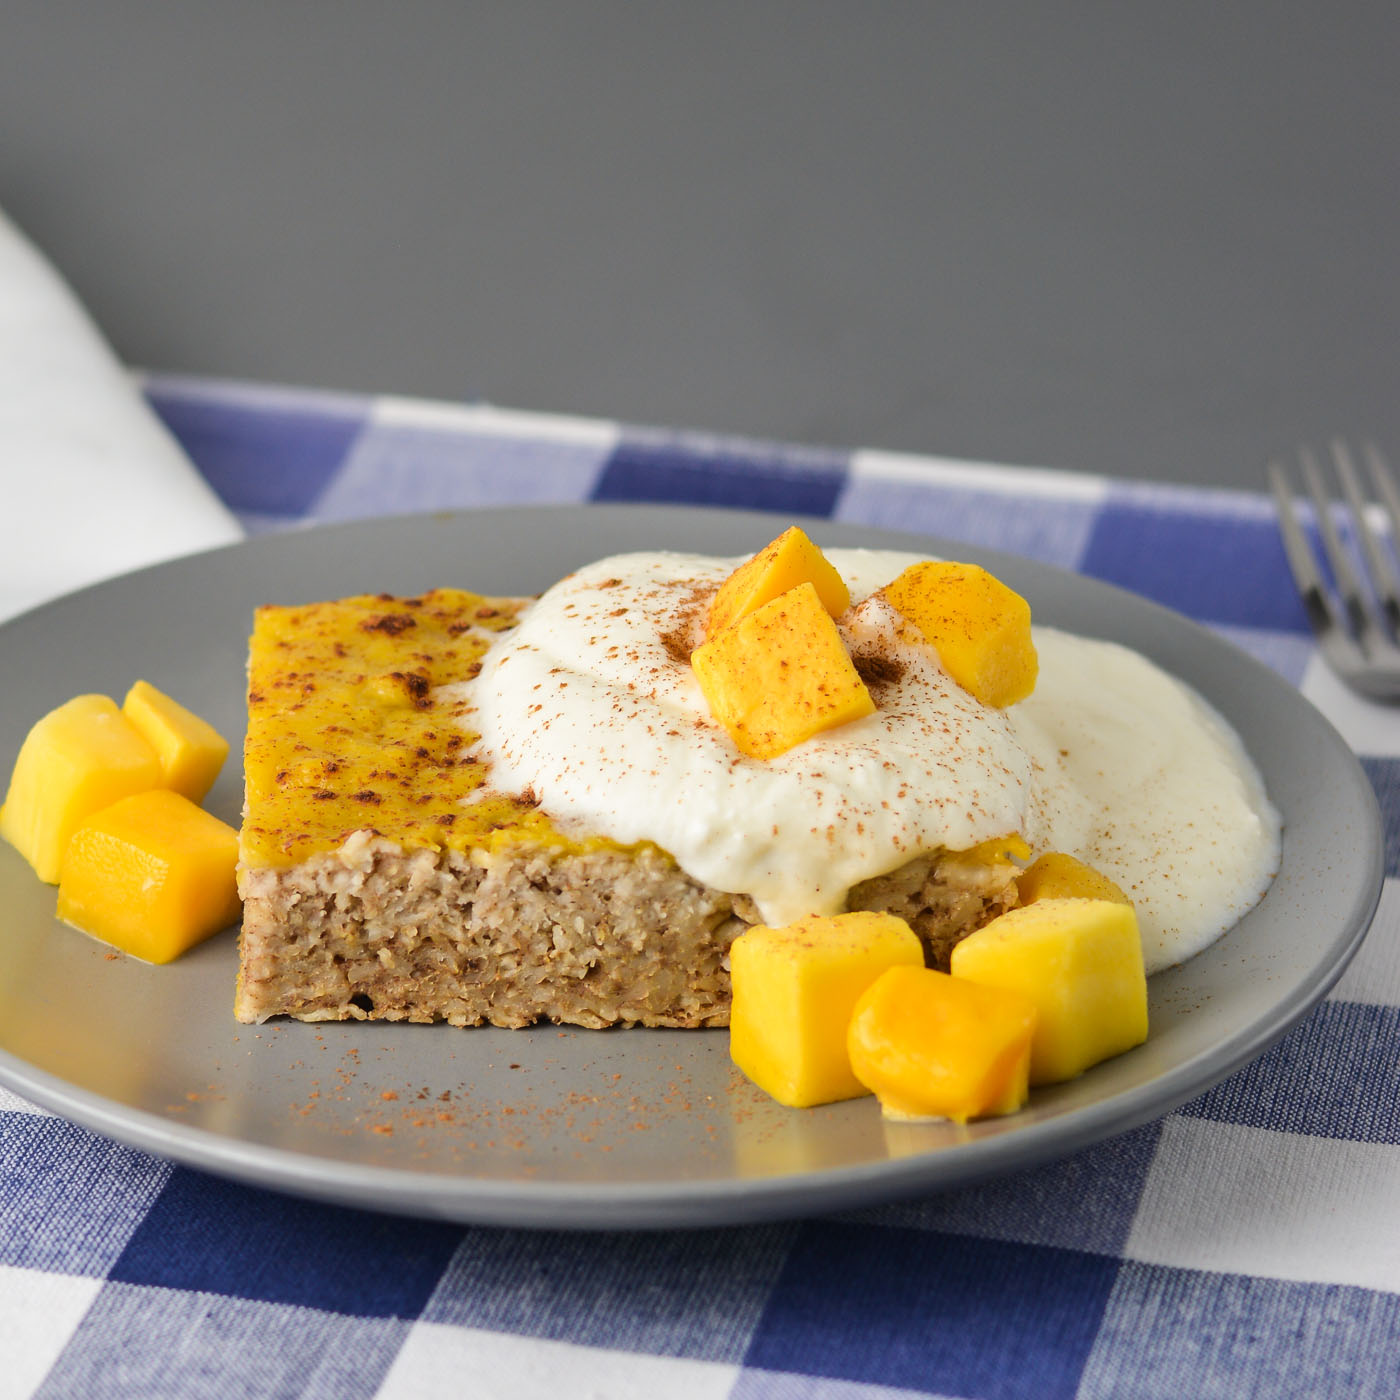 Mango Baked Oatmeal (Or Mango Ginger Cardamom Oat Cake, if you prefer)   THM E, No Sugar Added, Low Fat, Gluten Free, Dairy Free